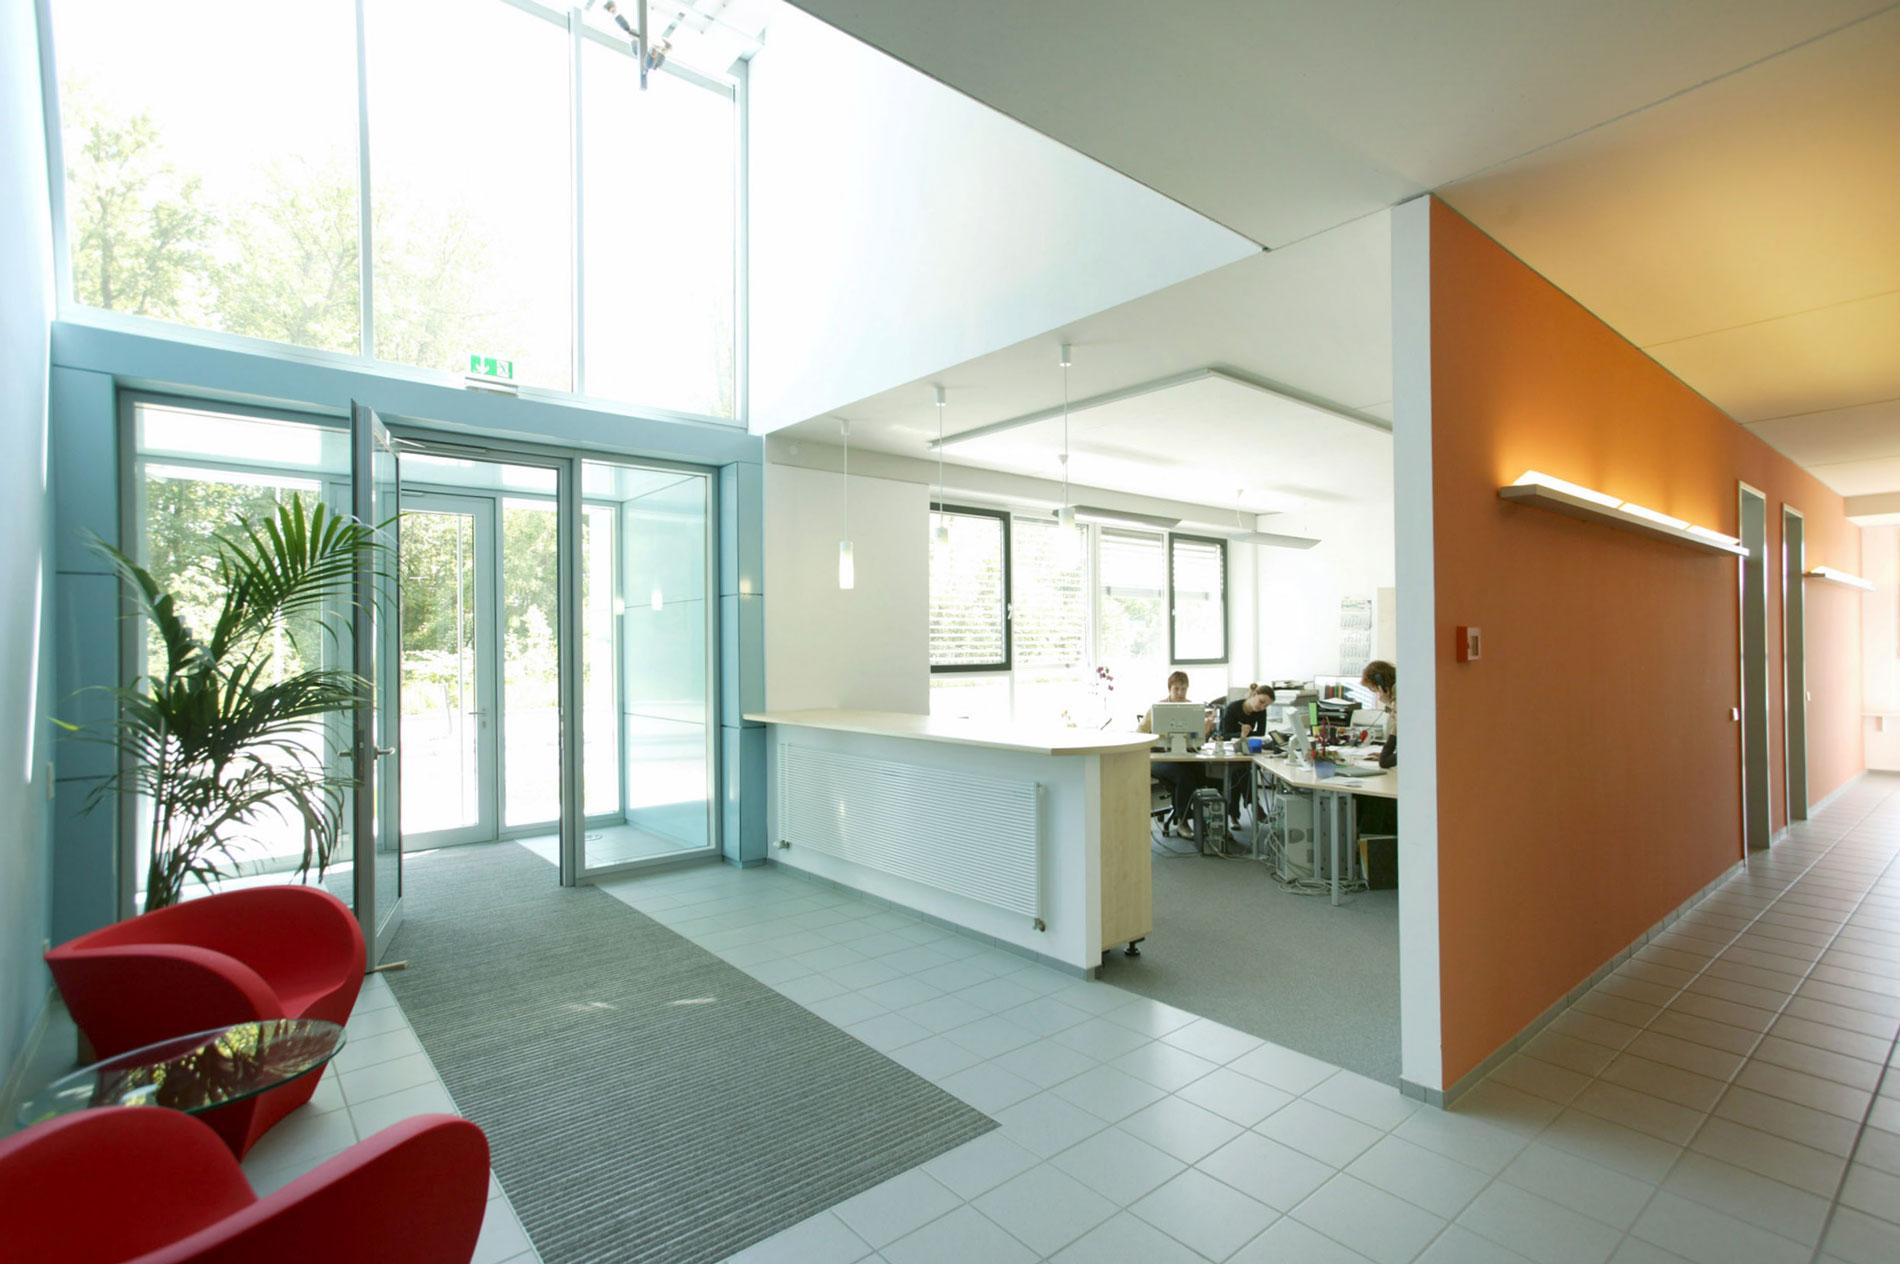 Innenarchitekt Karlsruhe rezeption innenarchitektur bisch otteni architekten karlsruhe